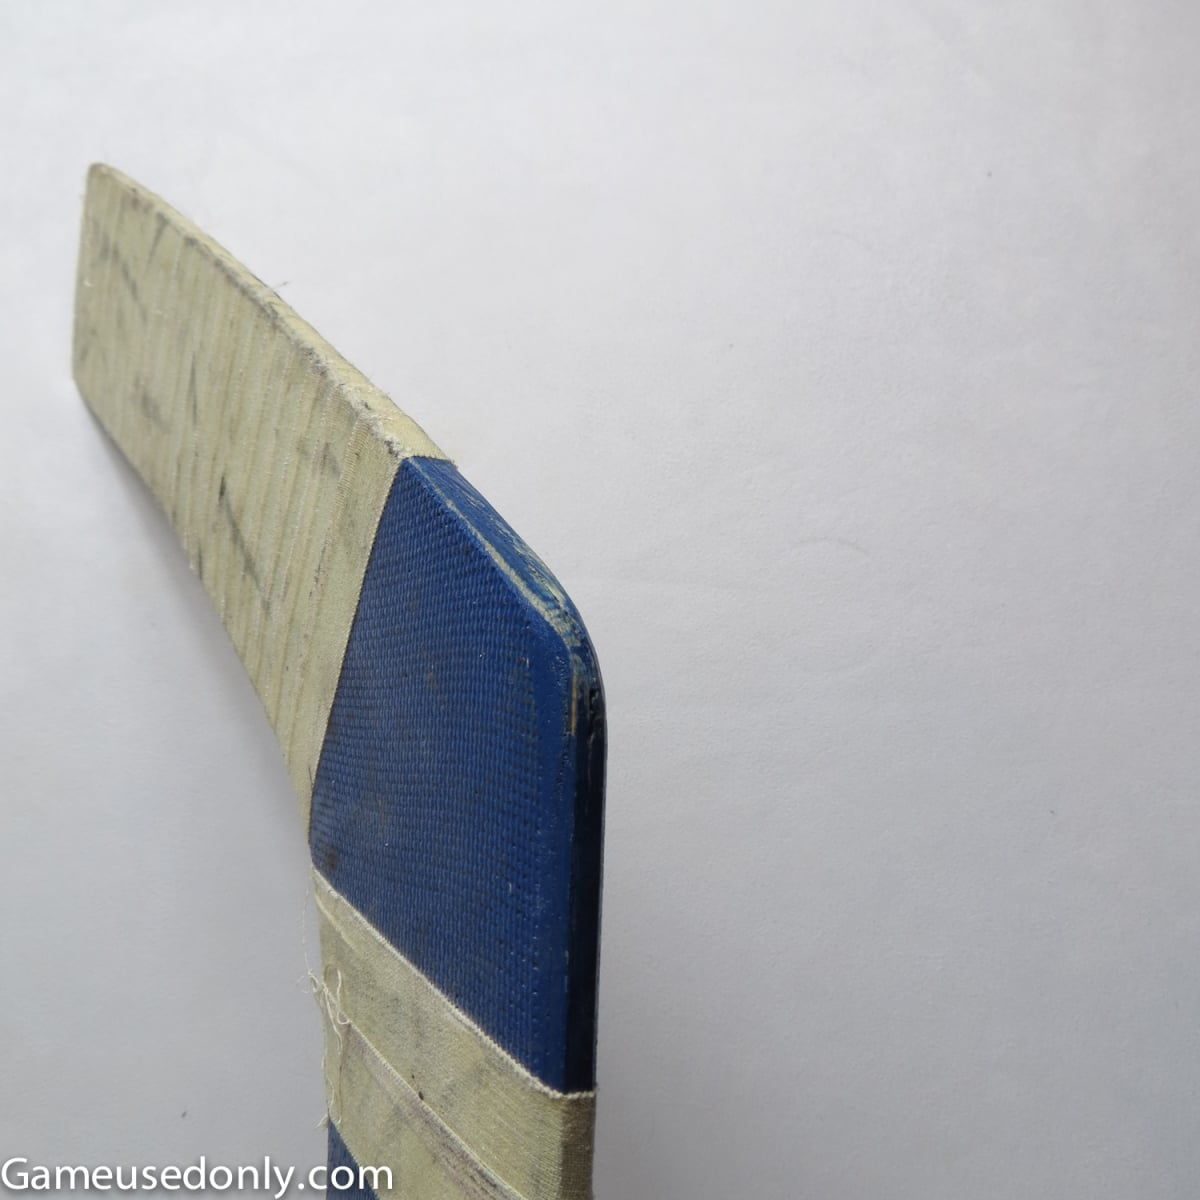 NHL-Goalie-stick-Rockies-1981